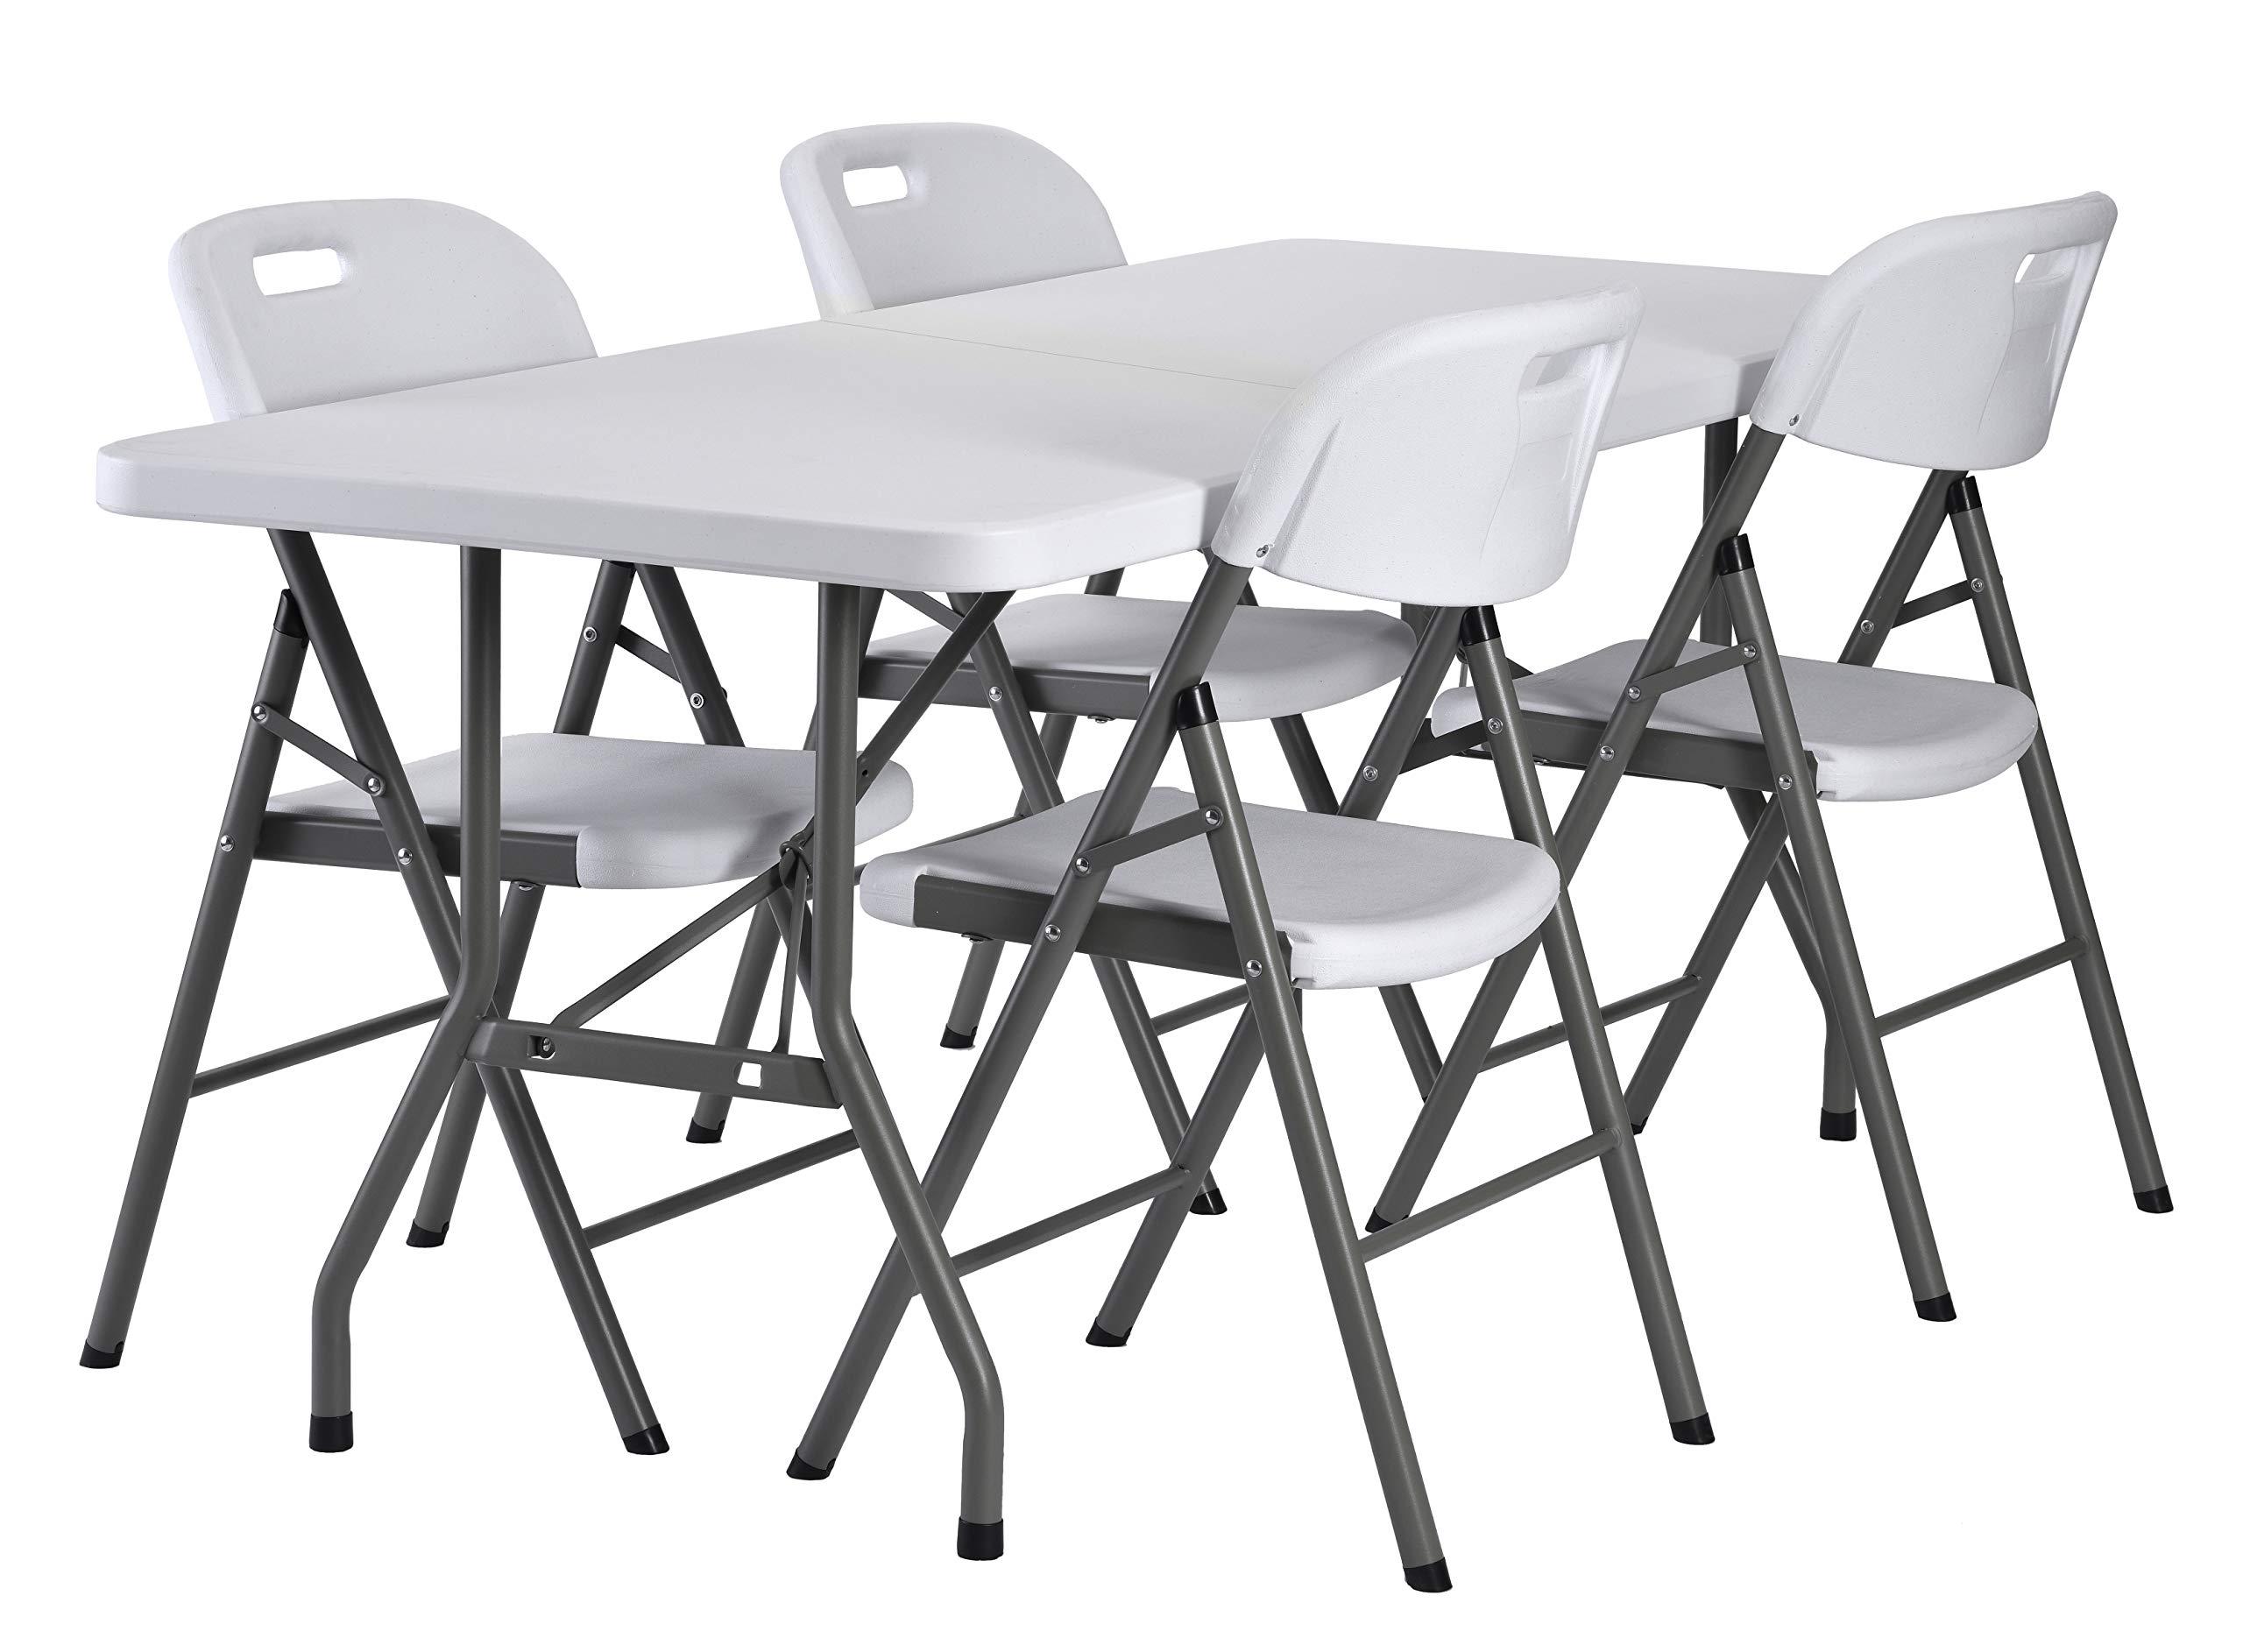 Sandusky Lee FPT7230-WV2 Commercial Fold in Half Utility Table, 6', White, 29'' Height, 72'' Width, 30'' Length by Sandusky (Image #6)